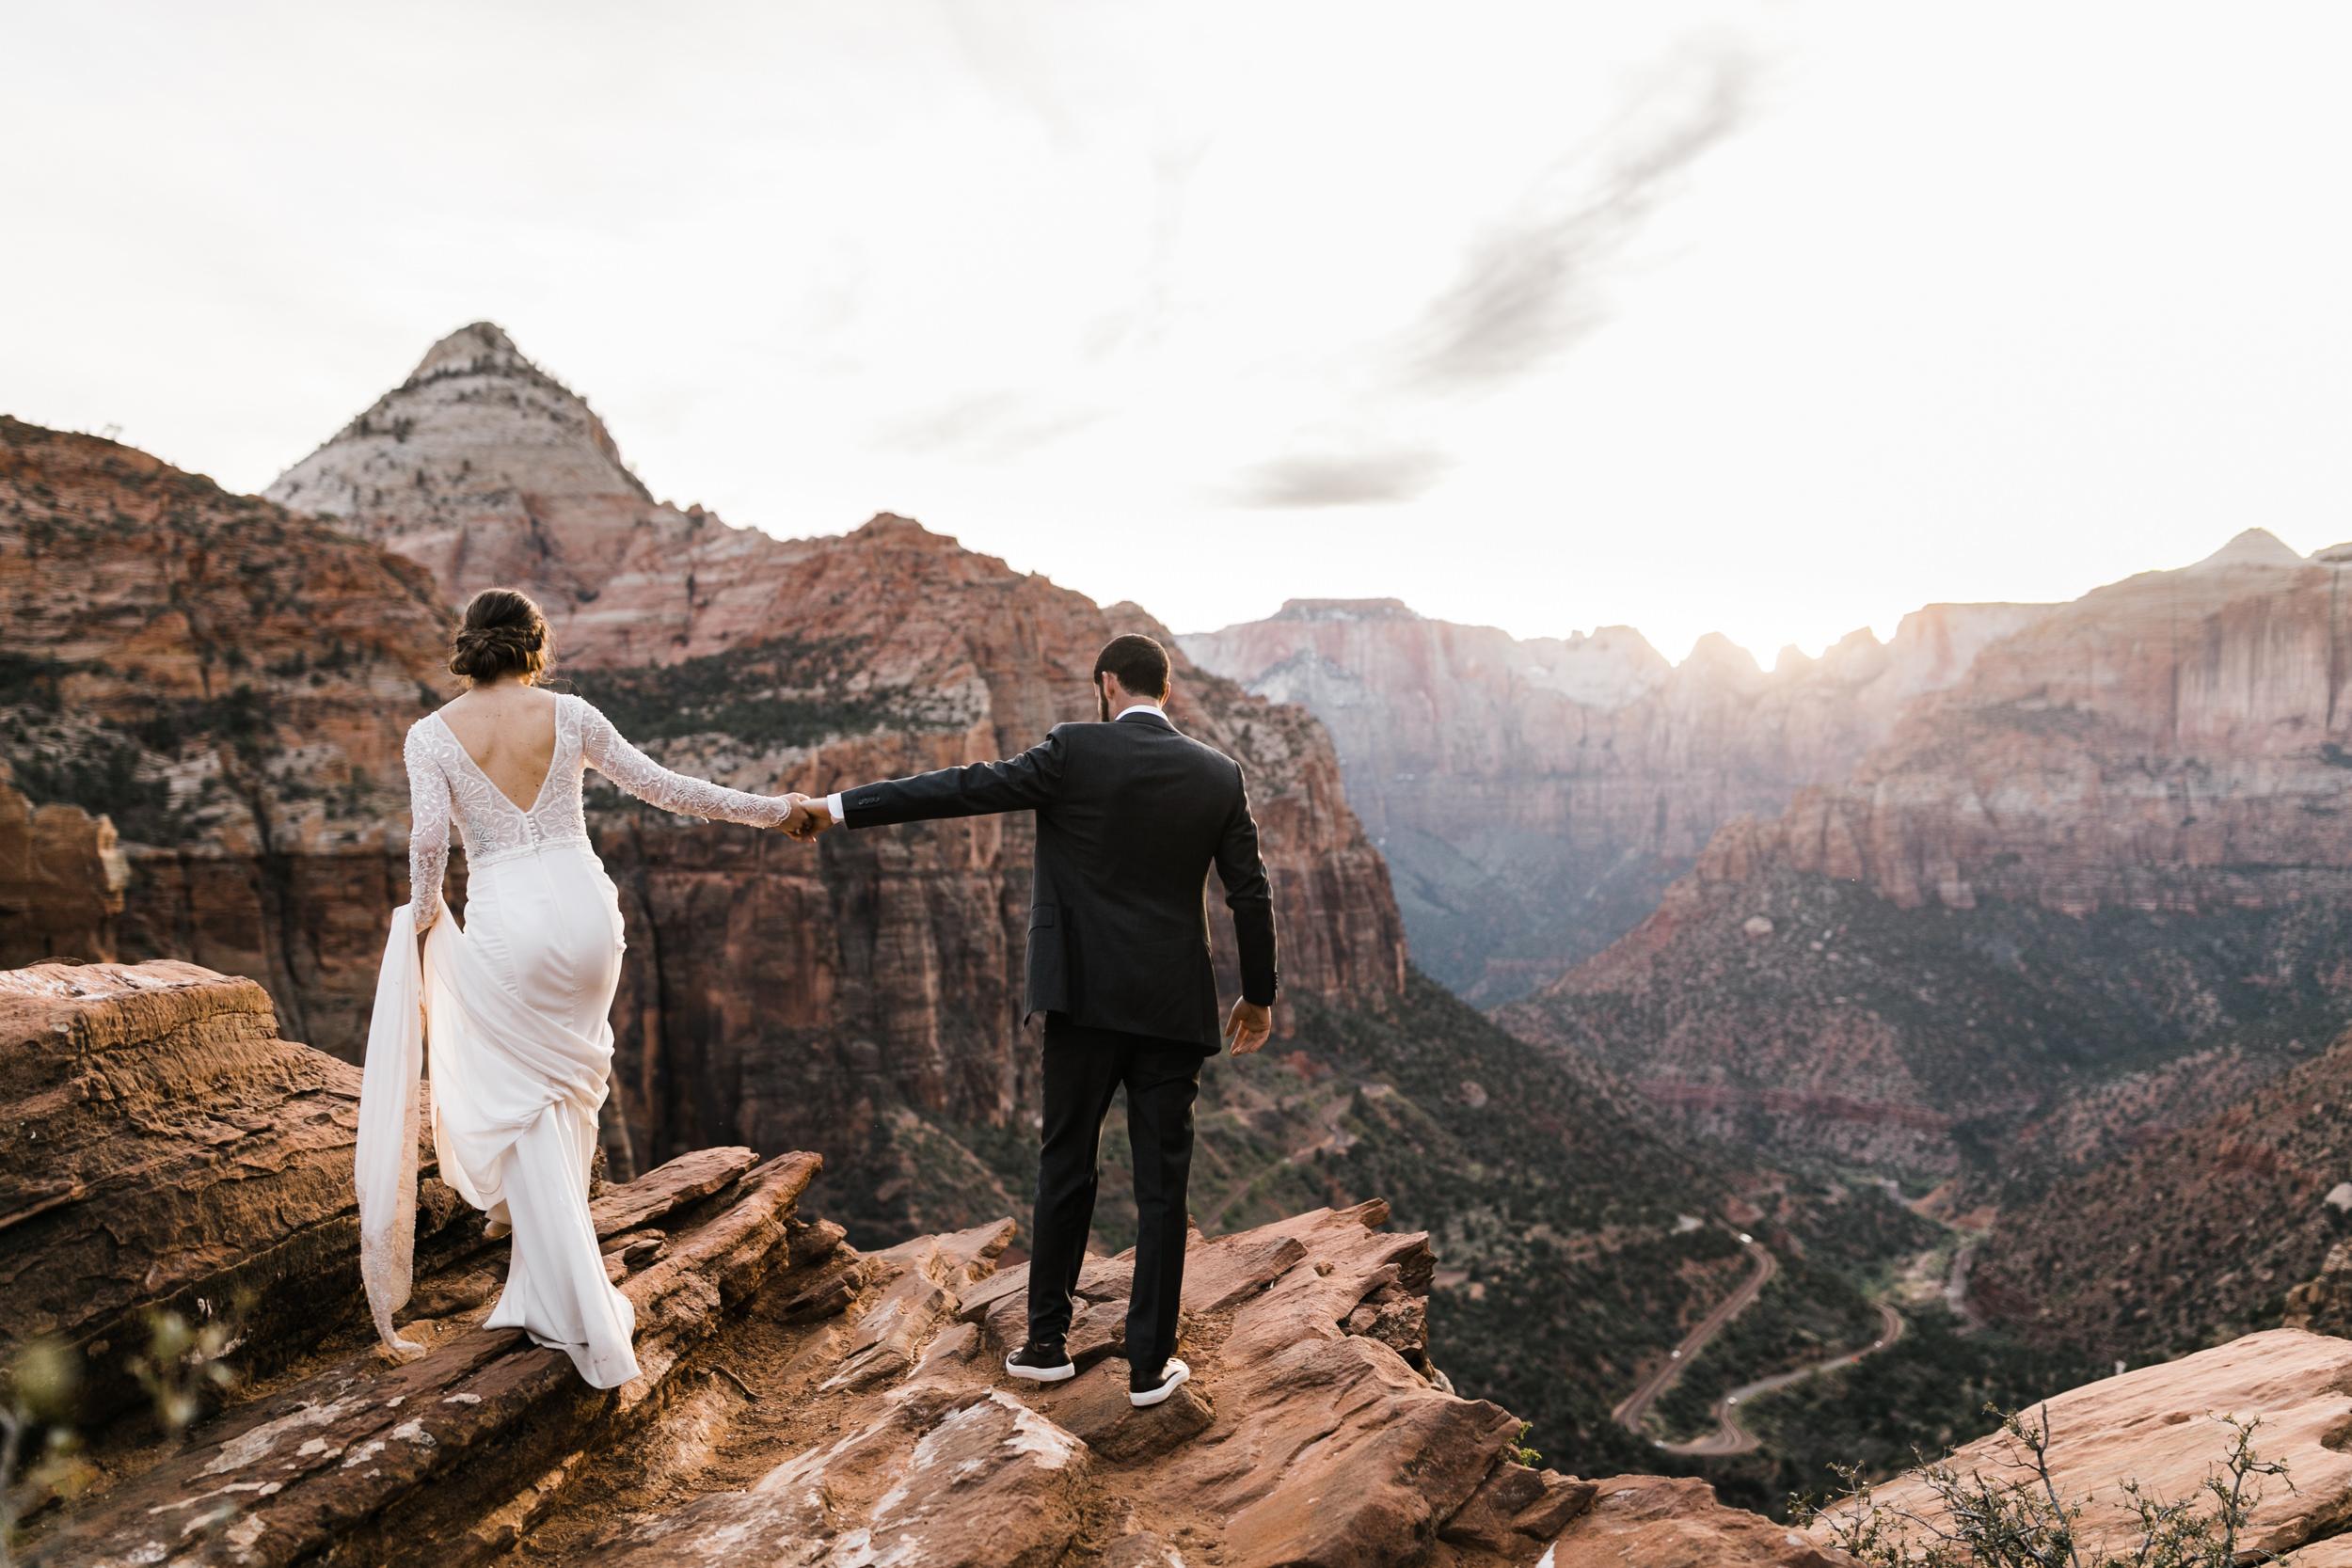 Zion-National-Park-Adventure-Wedding-Hearnes-Elopement-Photography-55.jpg